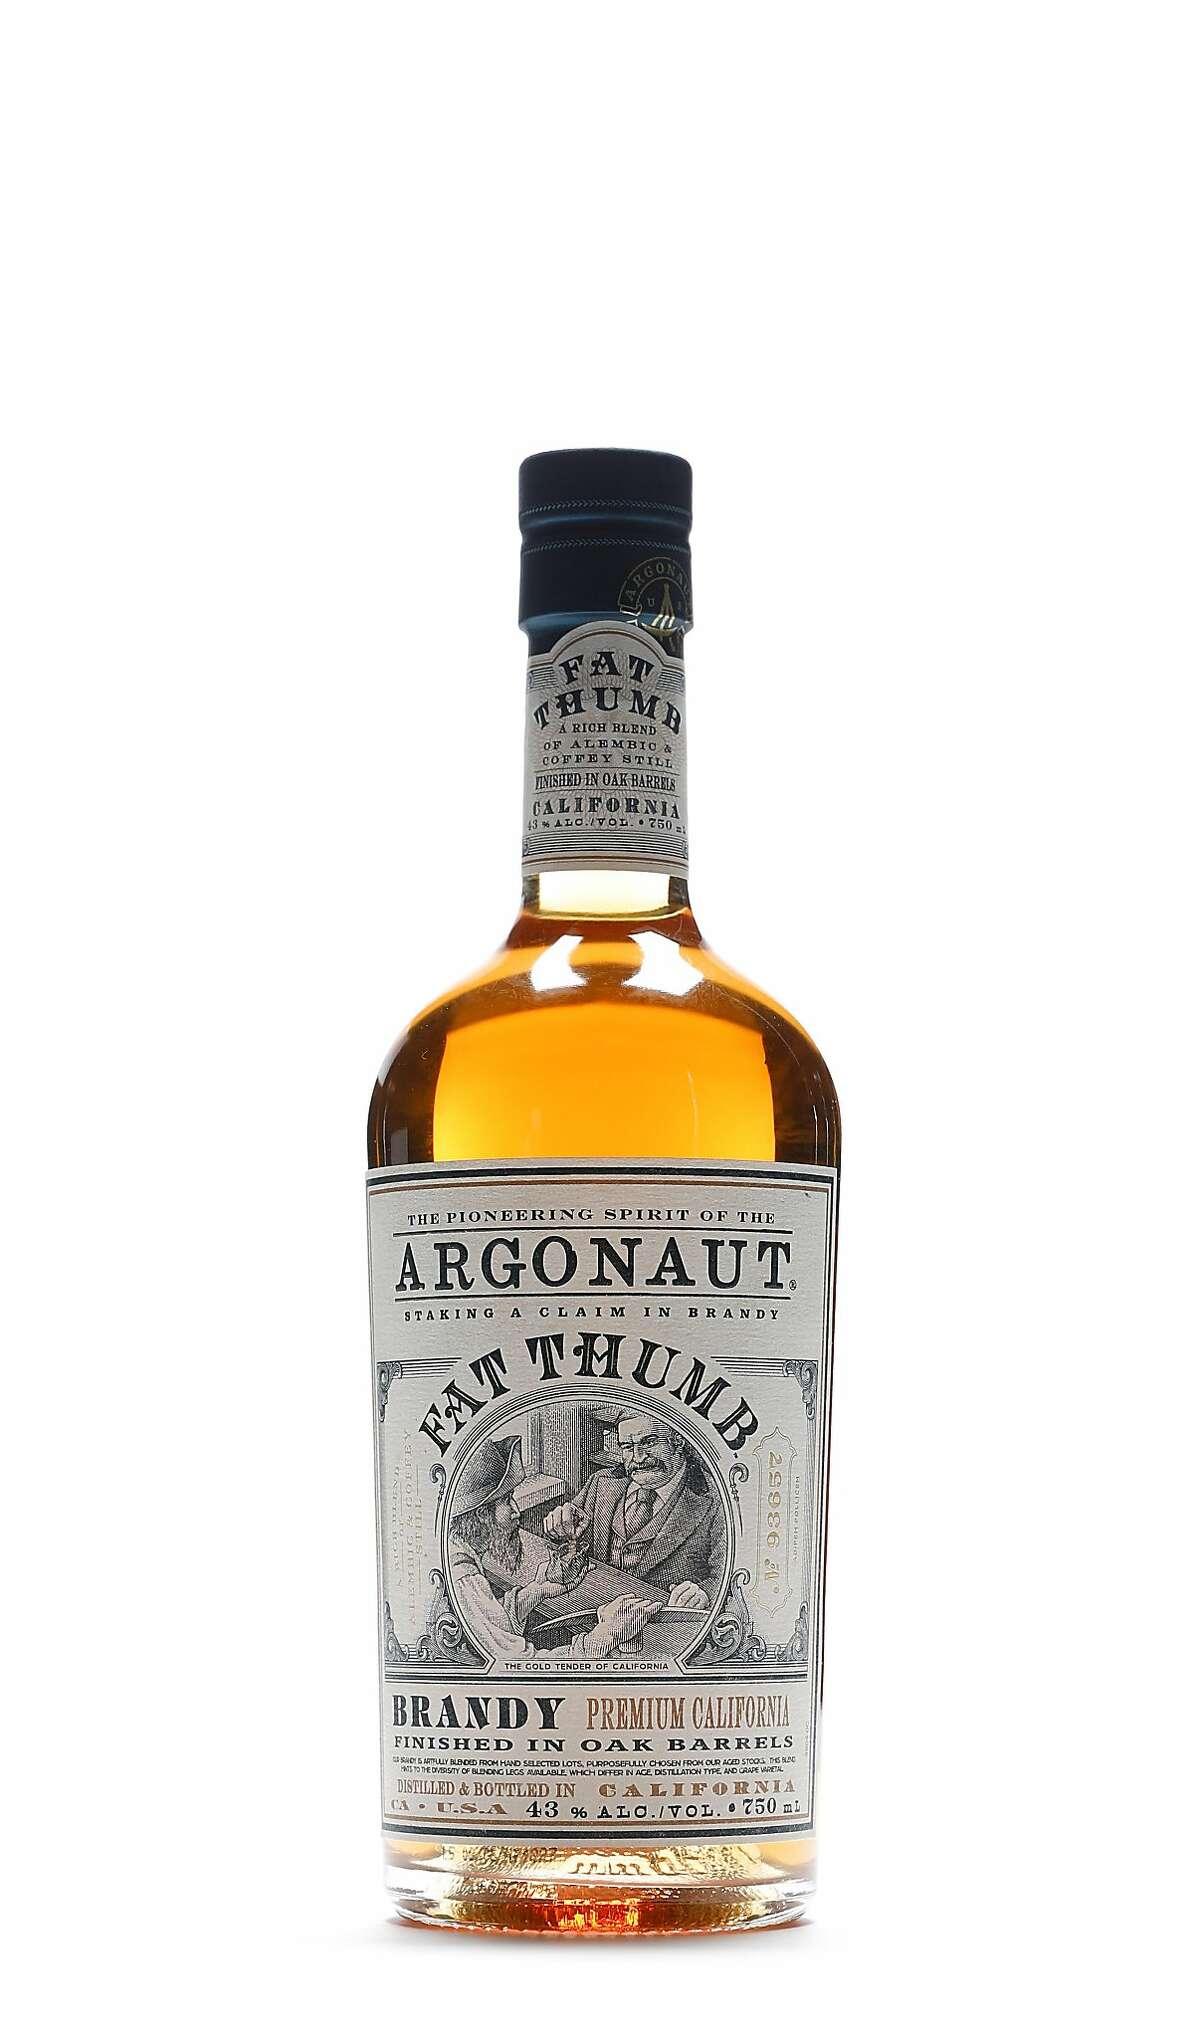 Argonaut Fat Thumb Brandy is seen on Tuesday, Oct. 9, 2018 in San Francisco, Calif.